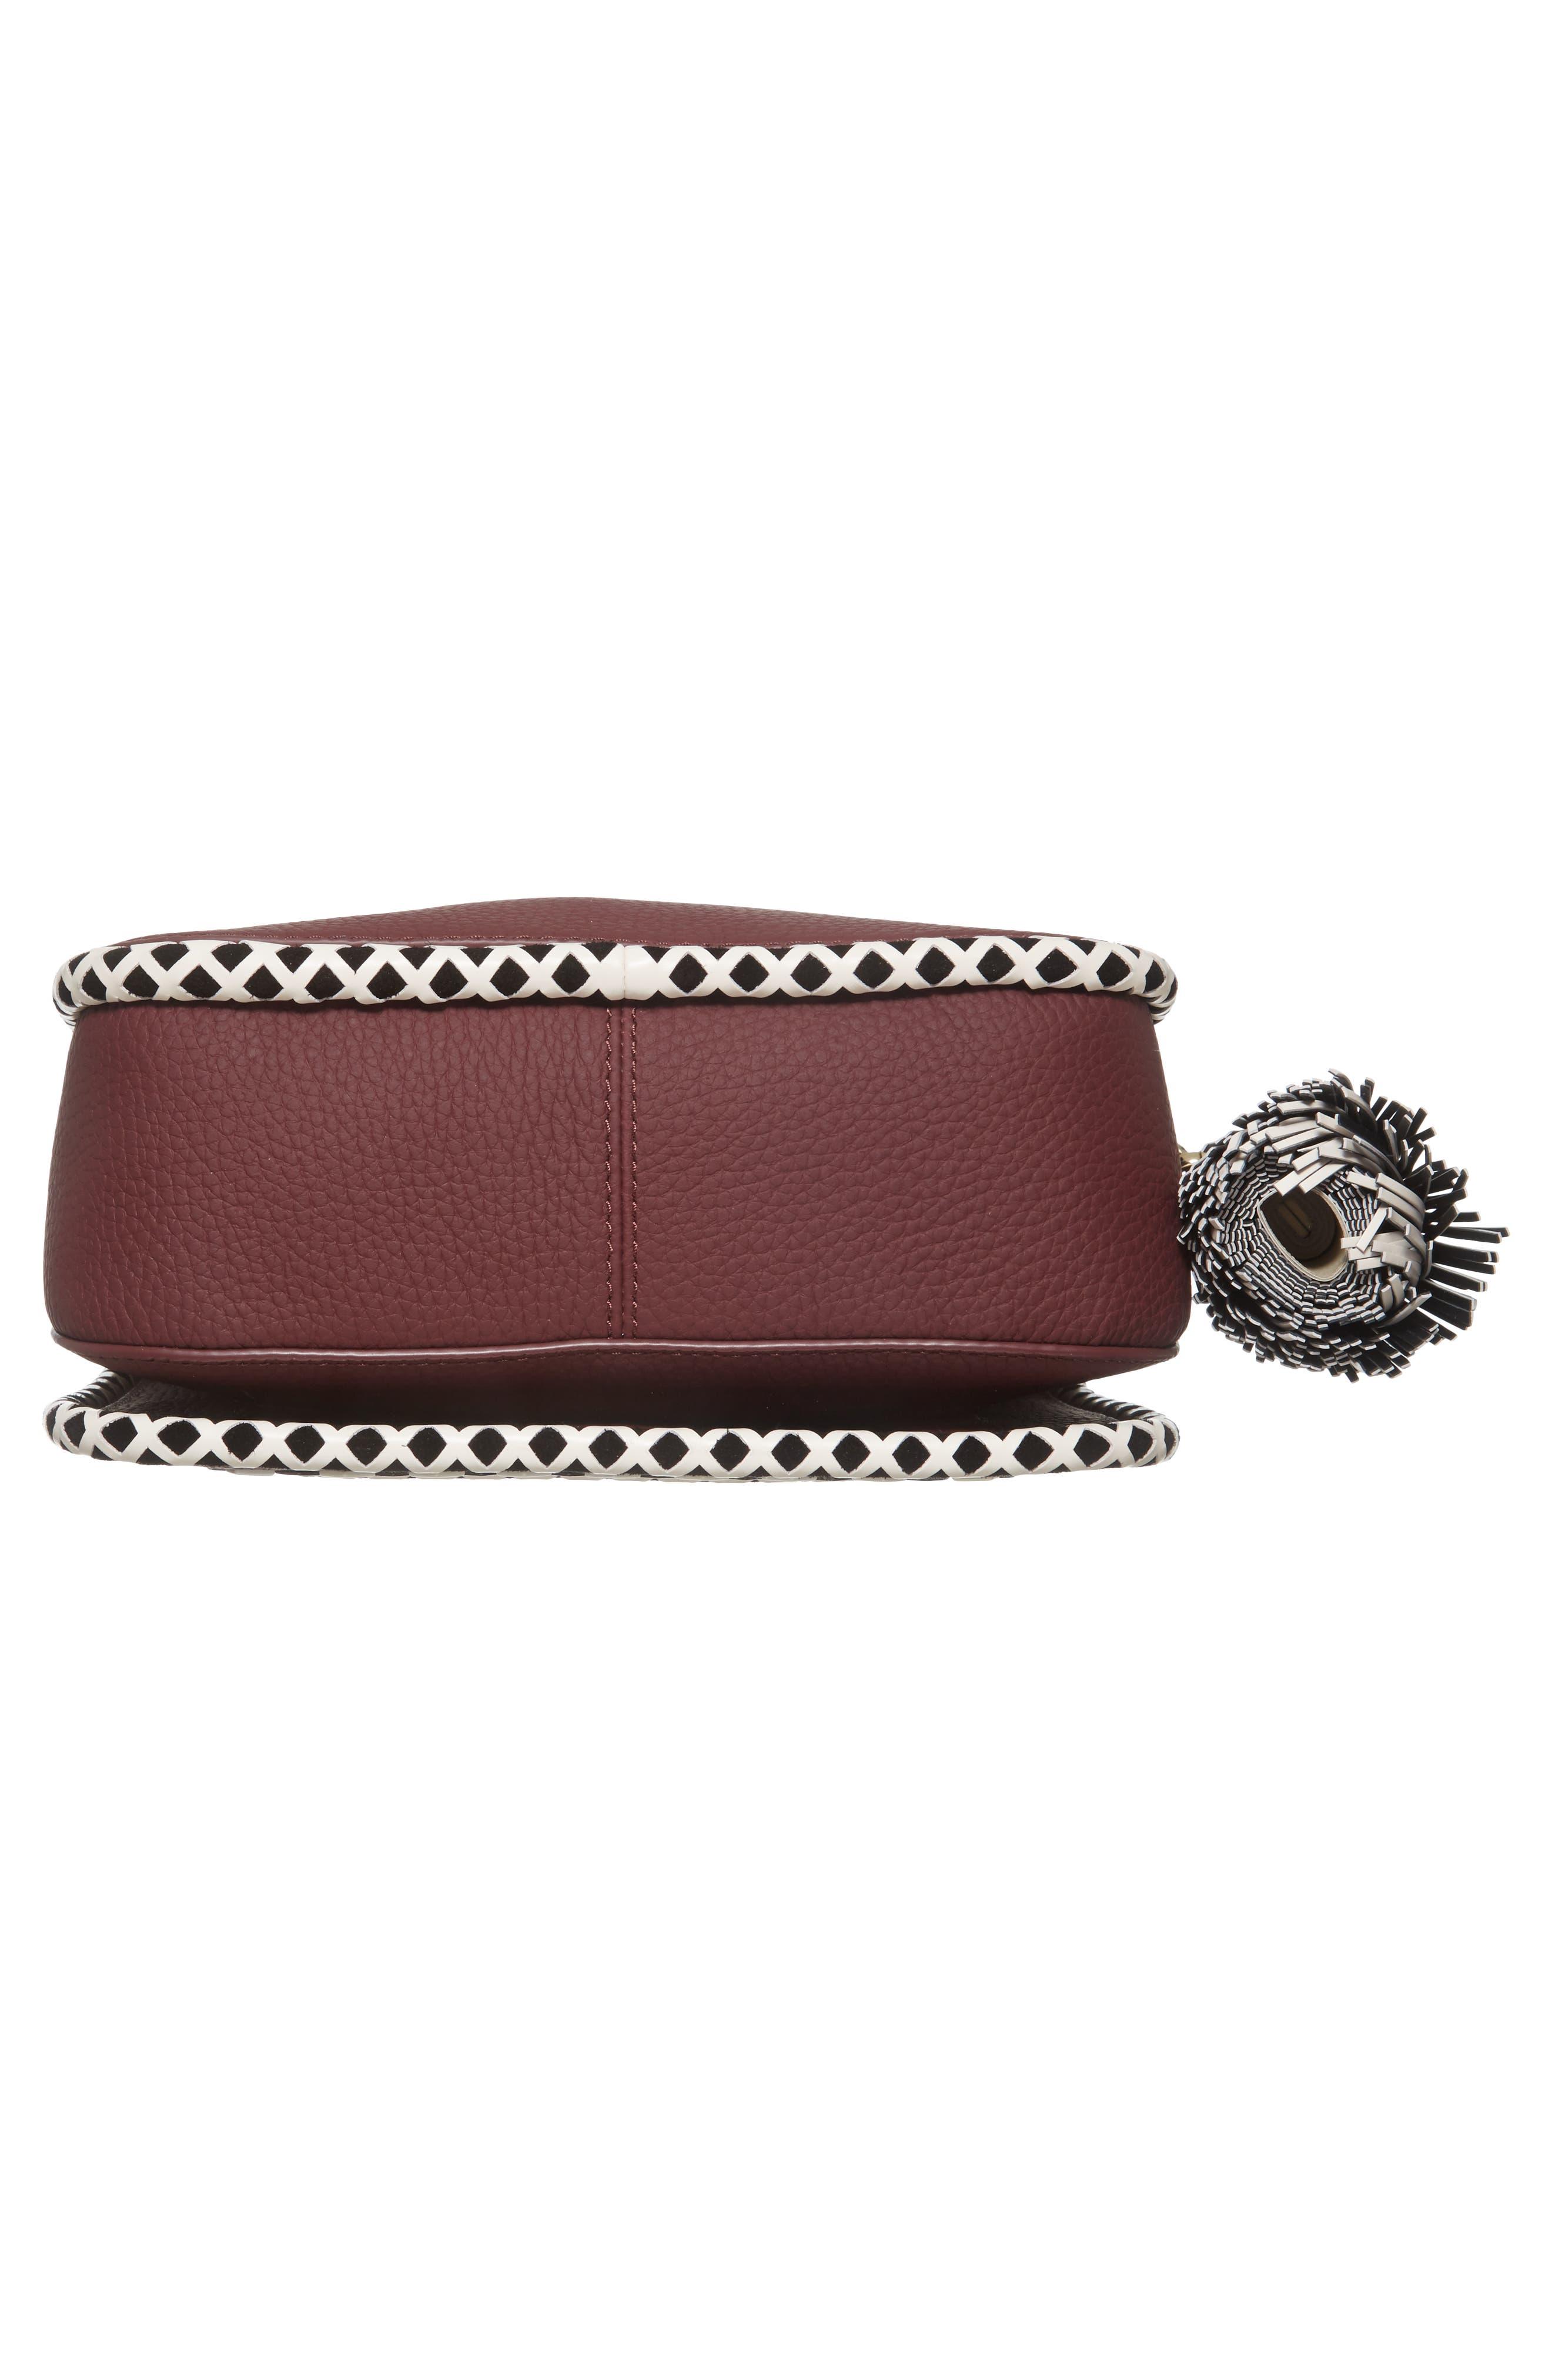 crown street - jasper leather saddle bag,                             Alternate thumbnail 12, color,